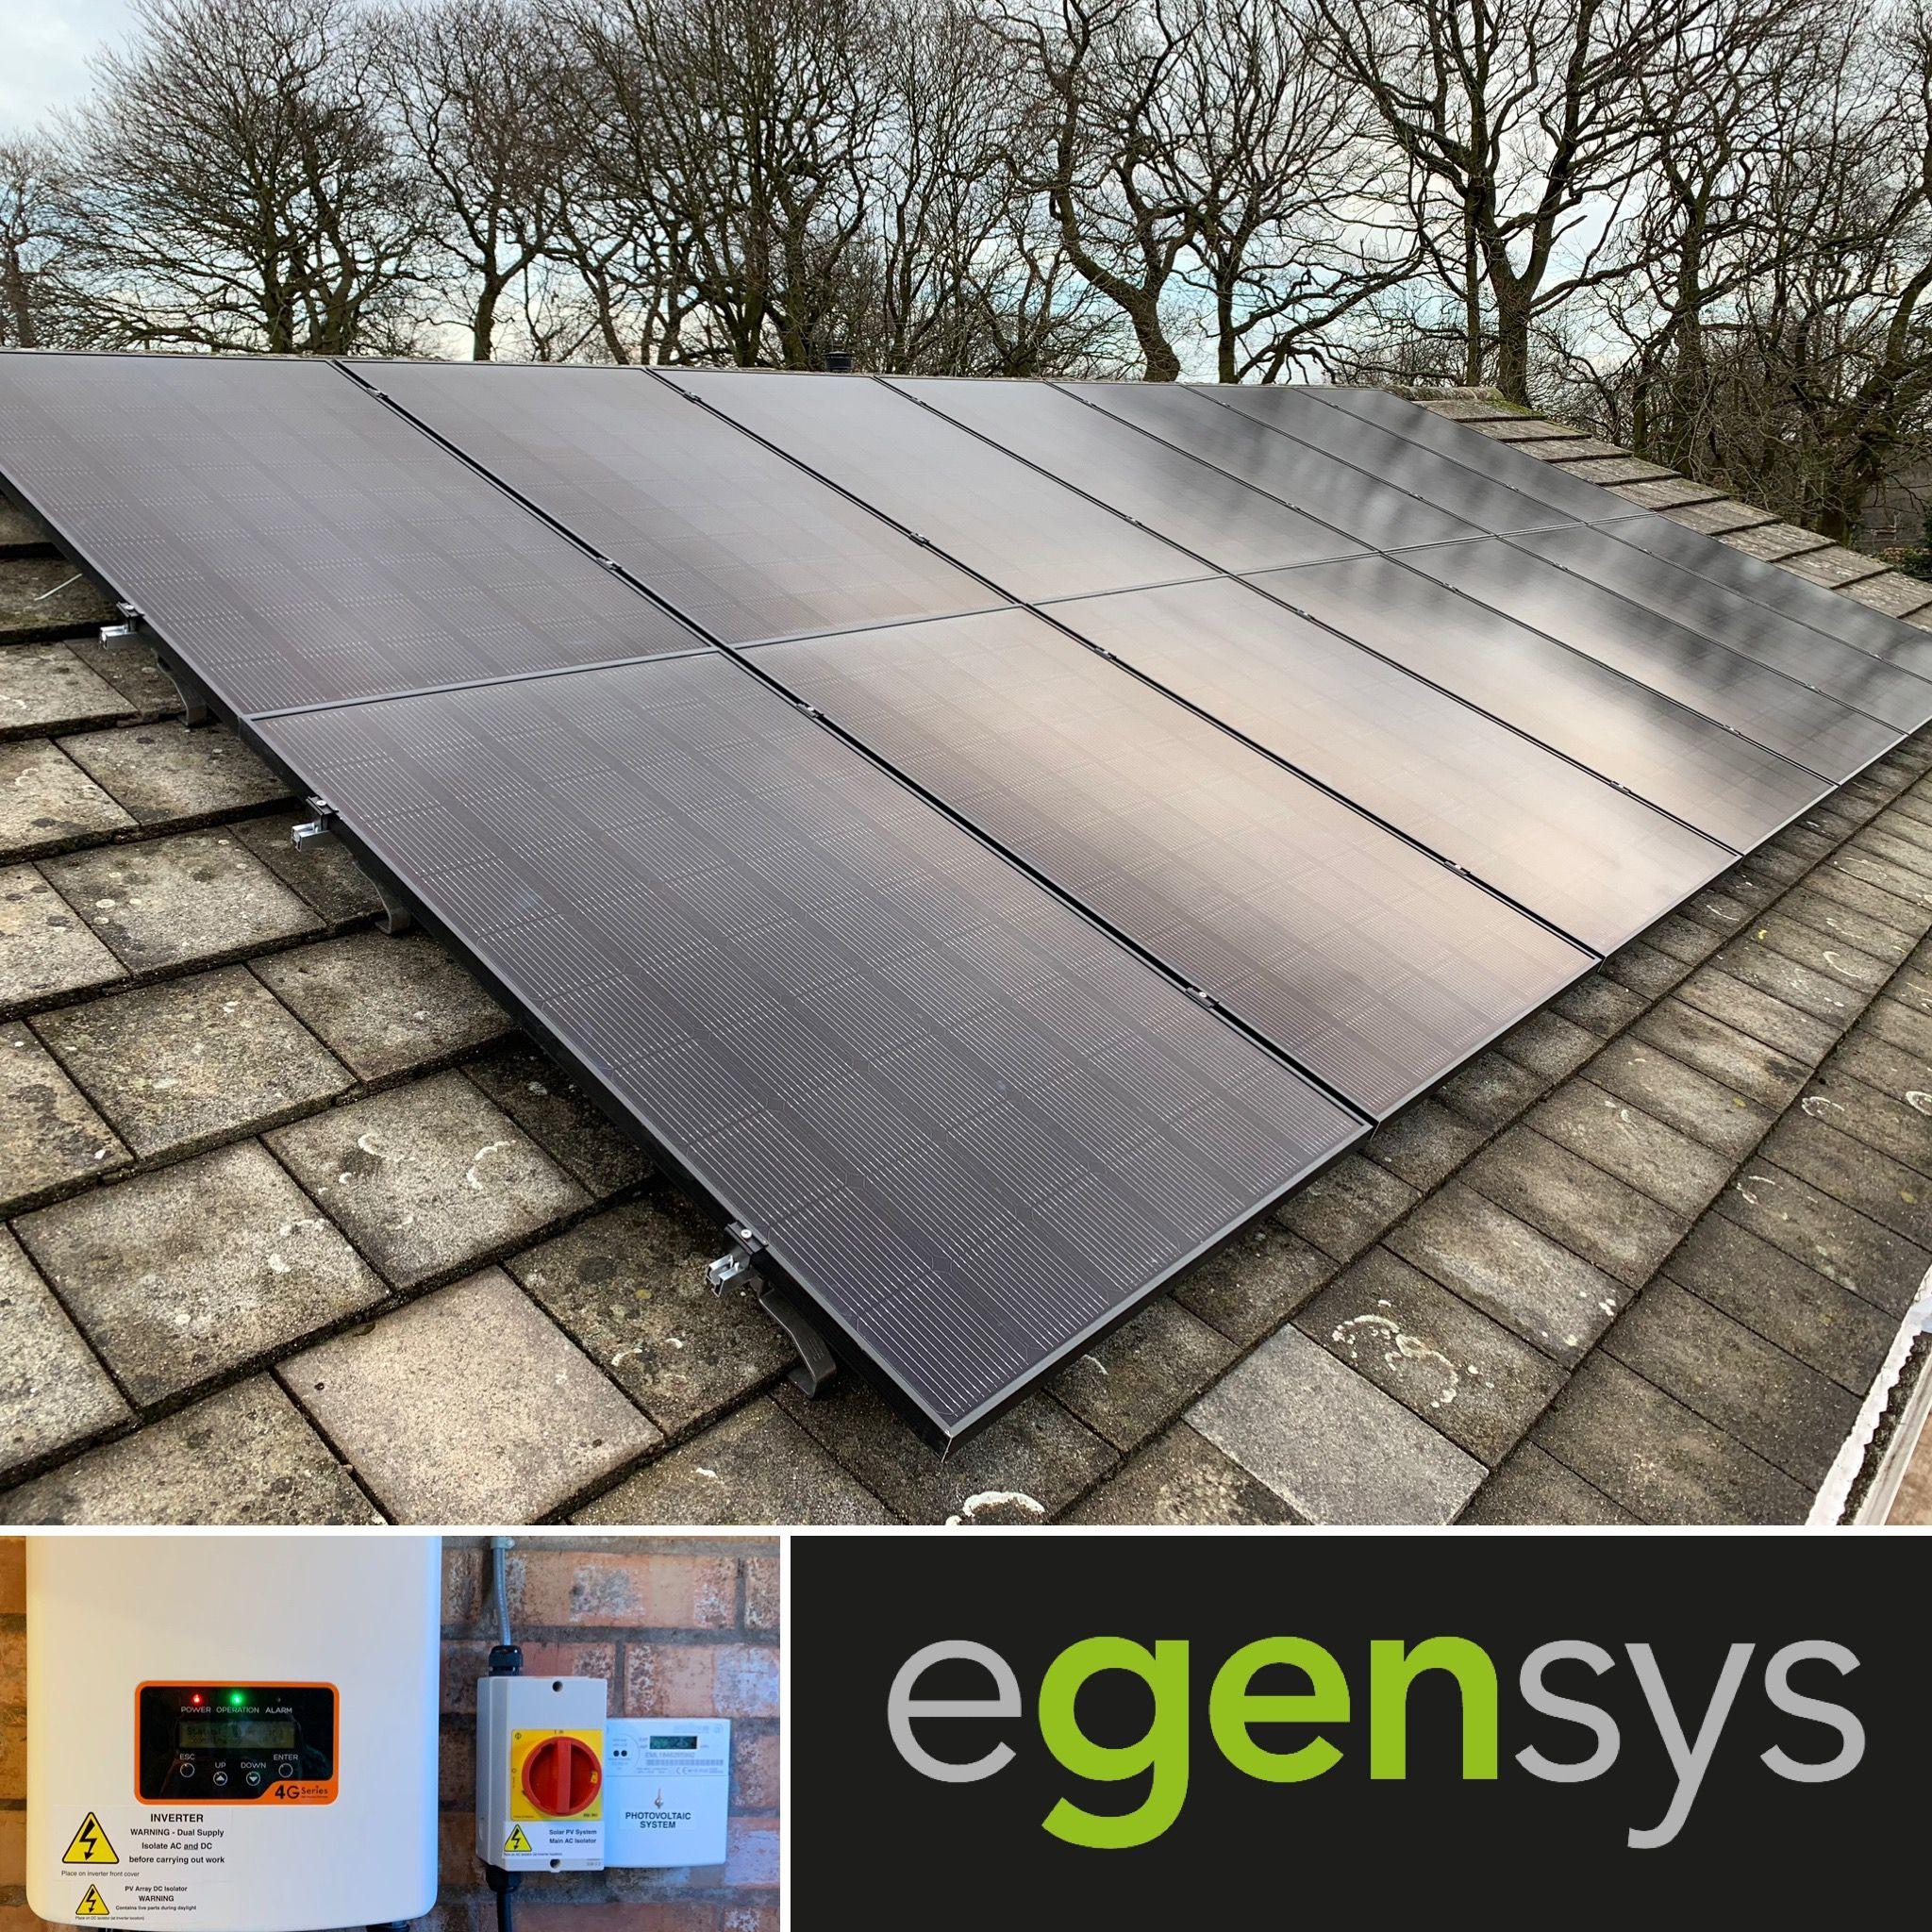 4 48kW solar panel system using 14 LG 320w (LG320N1K-V5) all